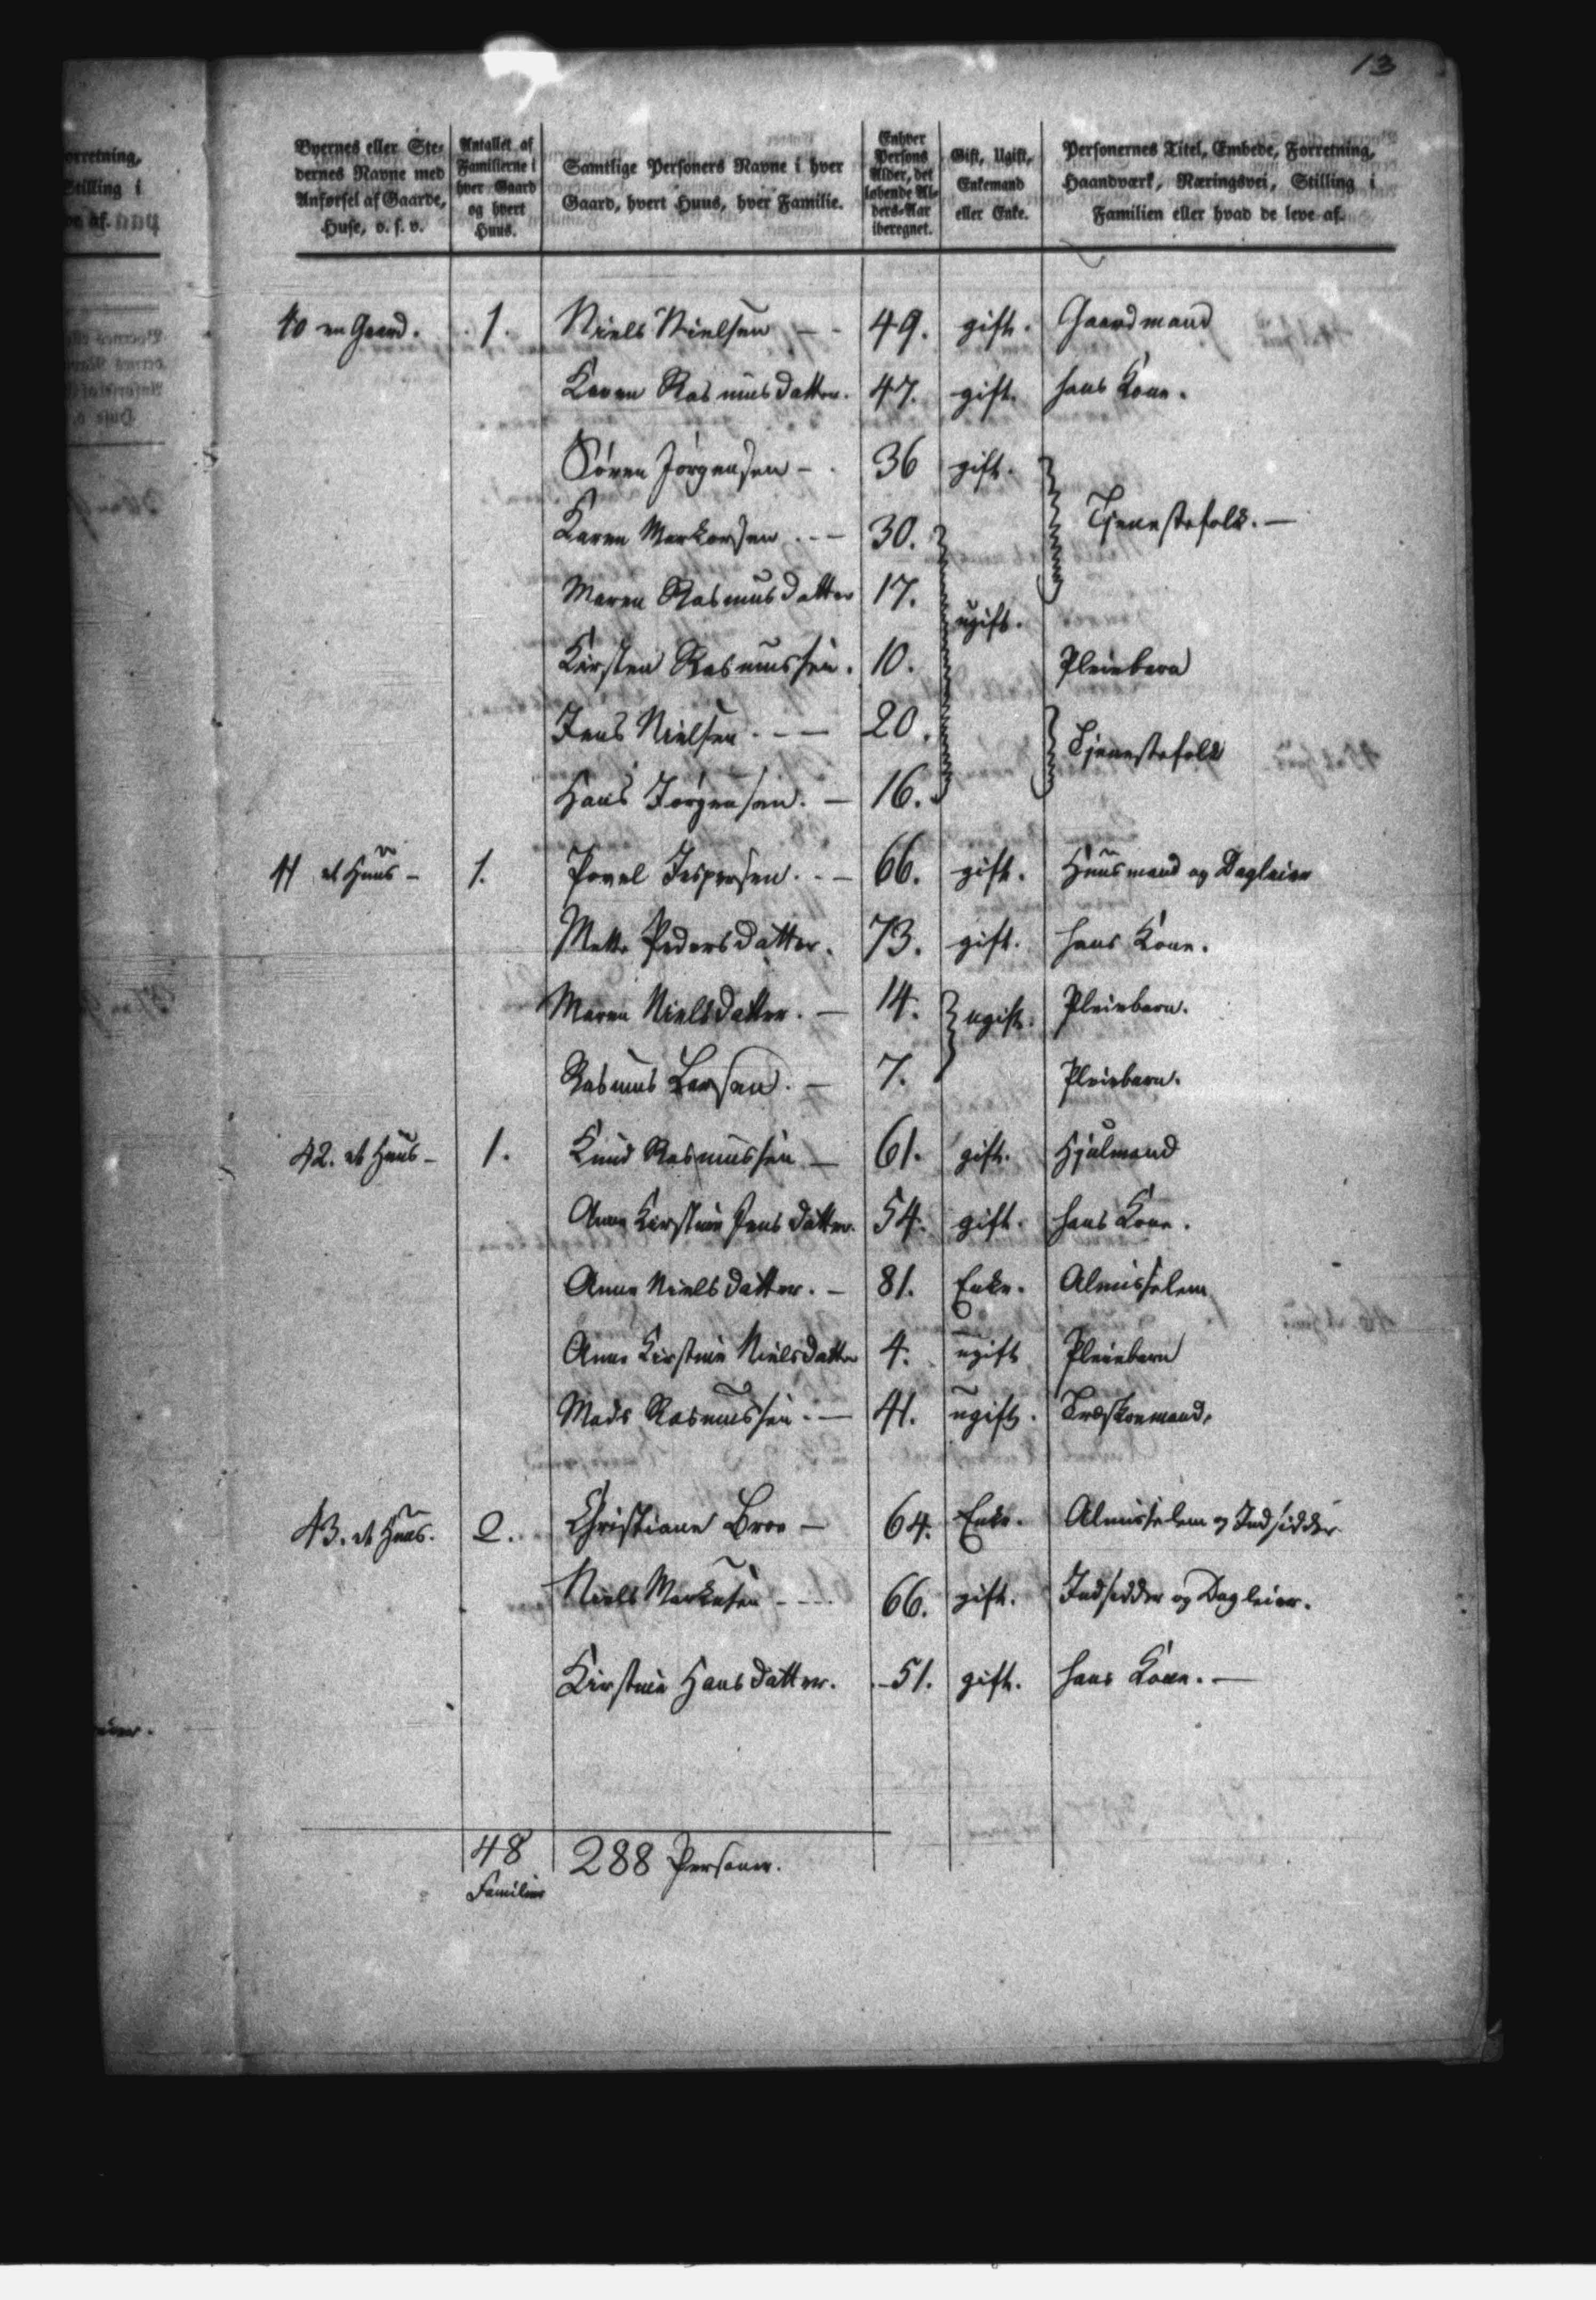 Maren Rasmusdatter- Census 1840 - Svendborg, Sallinge, Åstrup